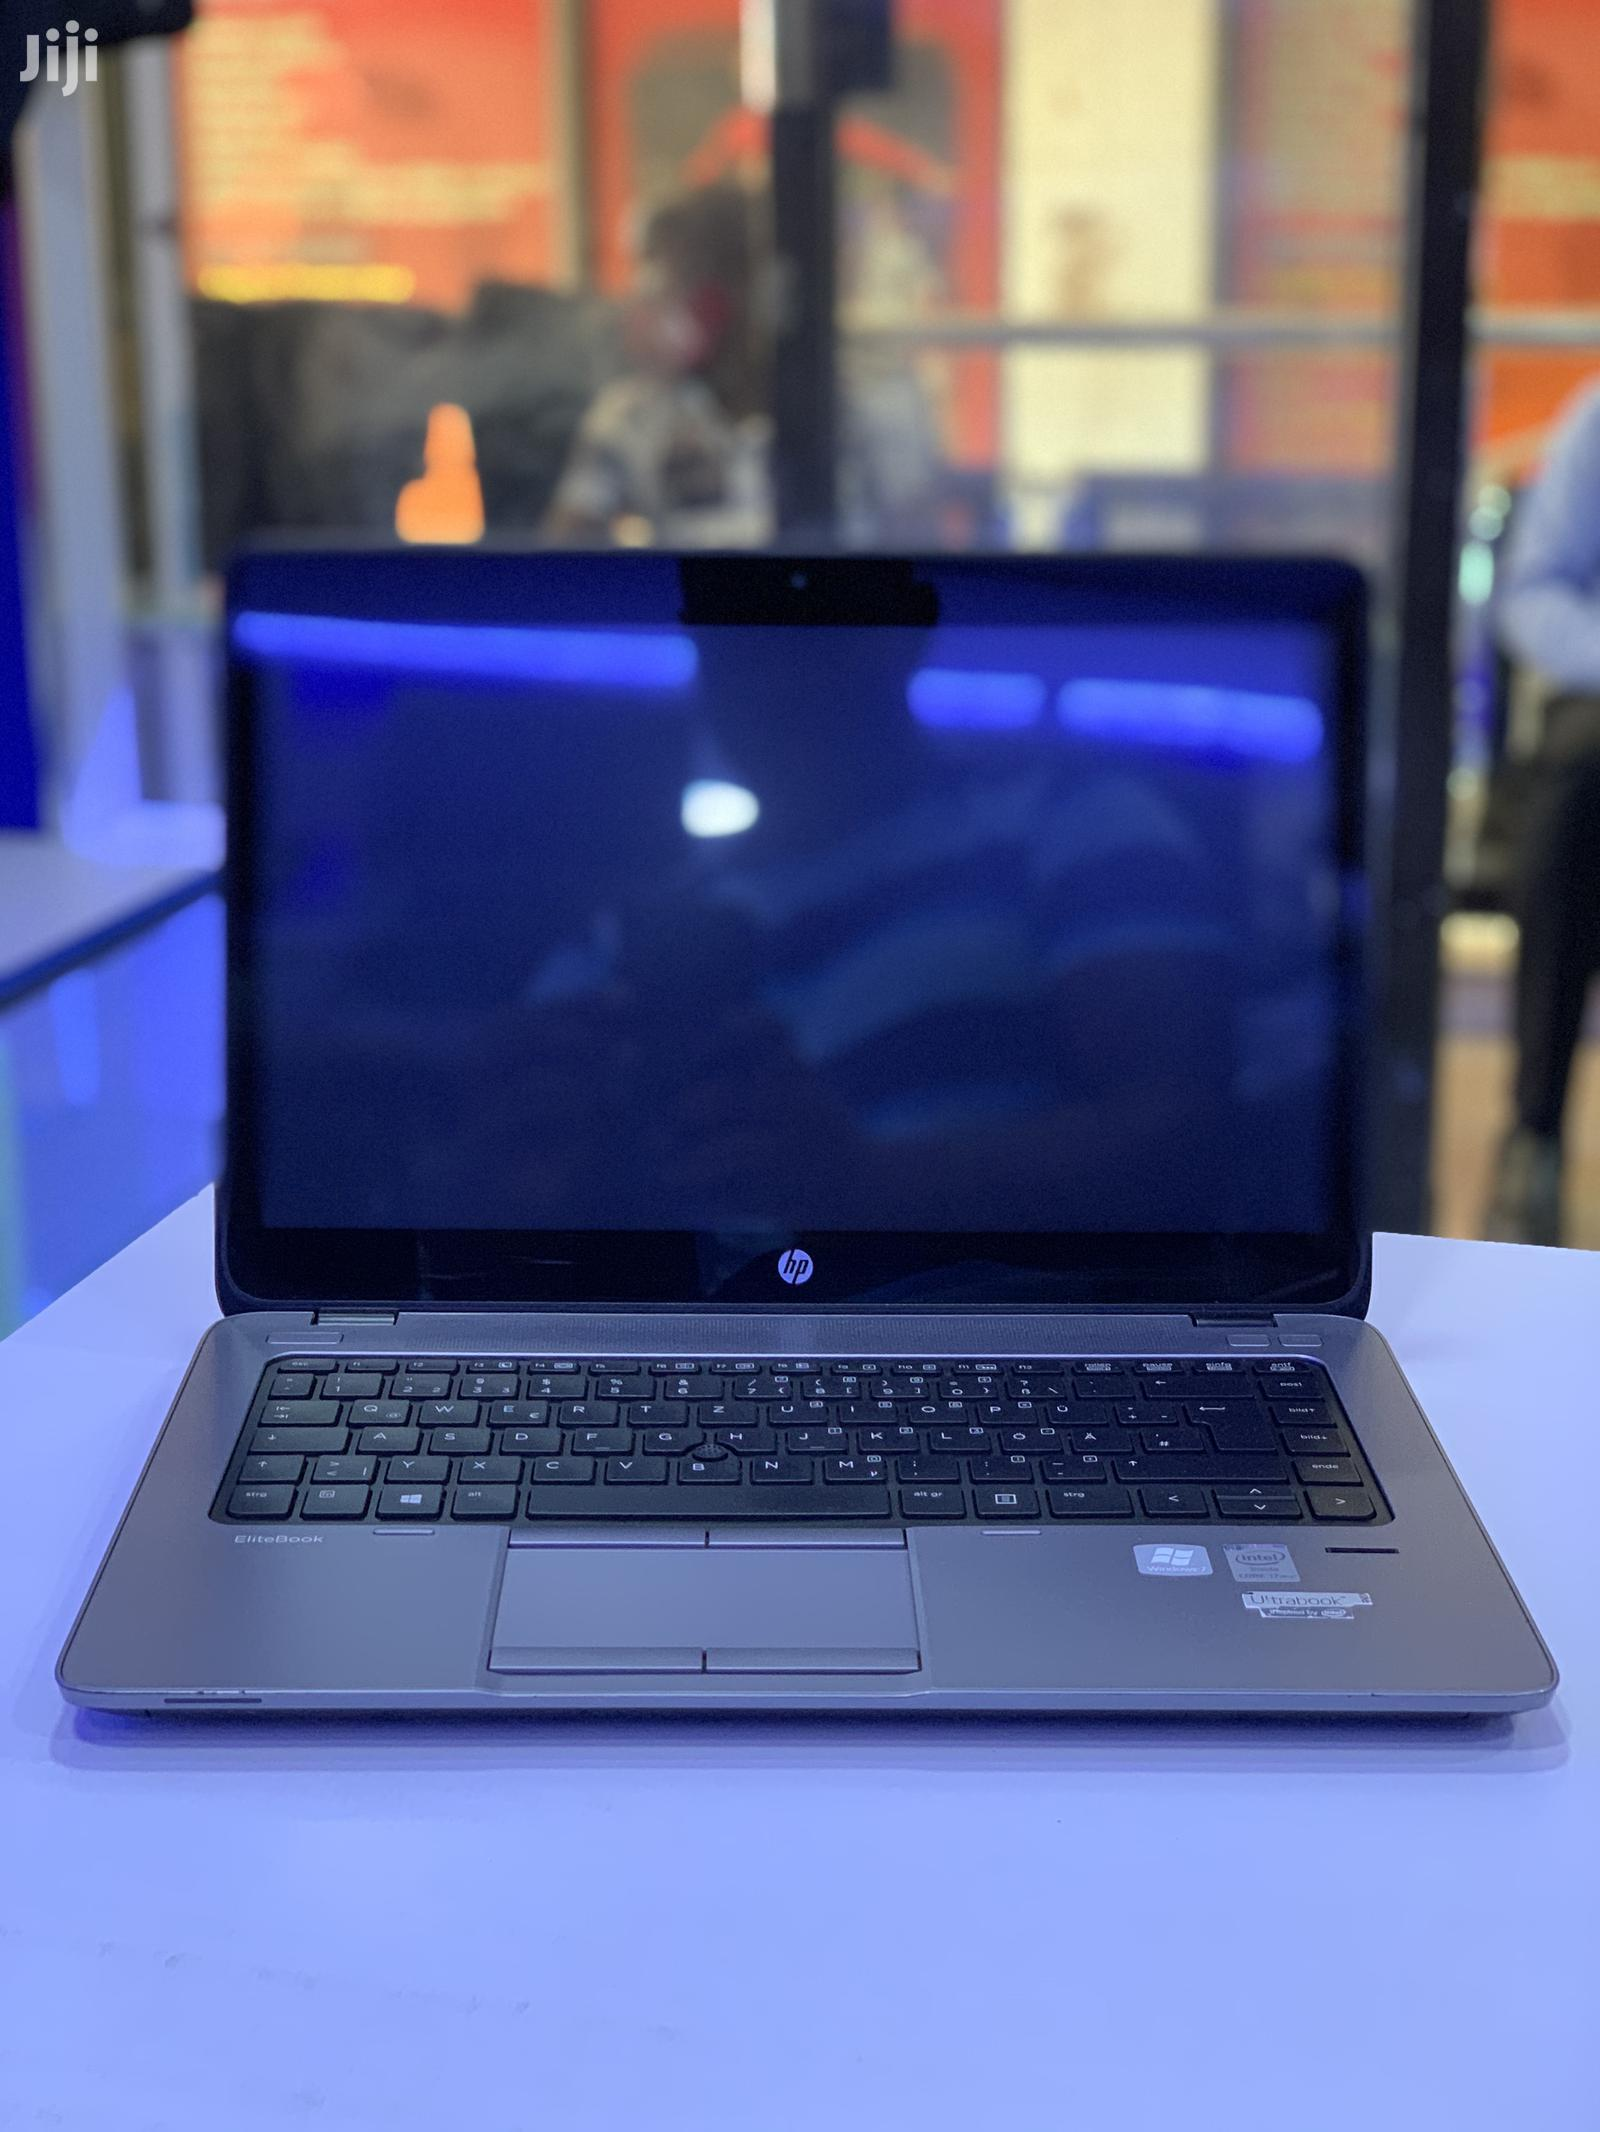 Archive: Laptop HP EliteBook 840 G1 8GB Intel Core I7 HDD 500GB